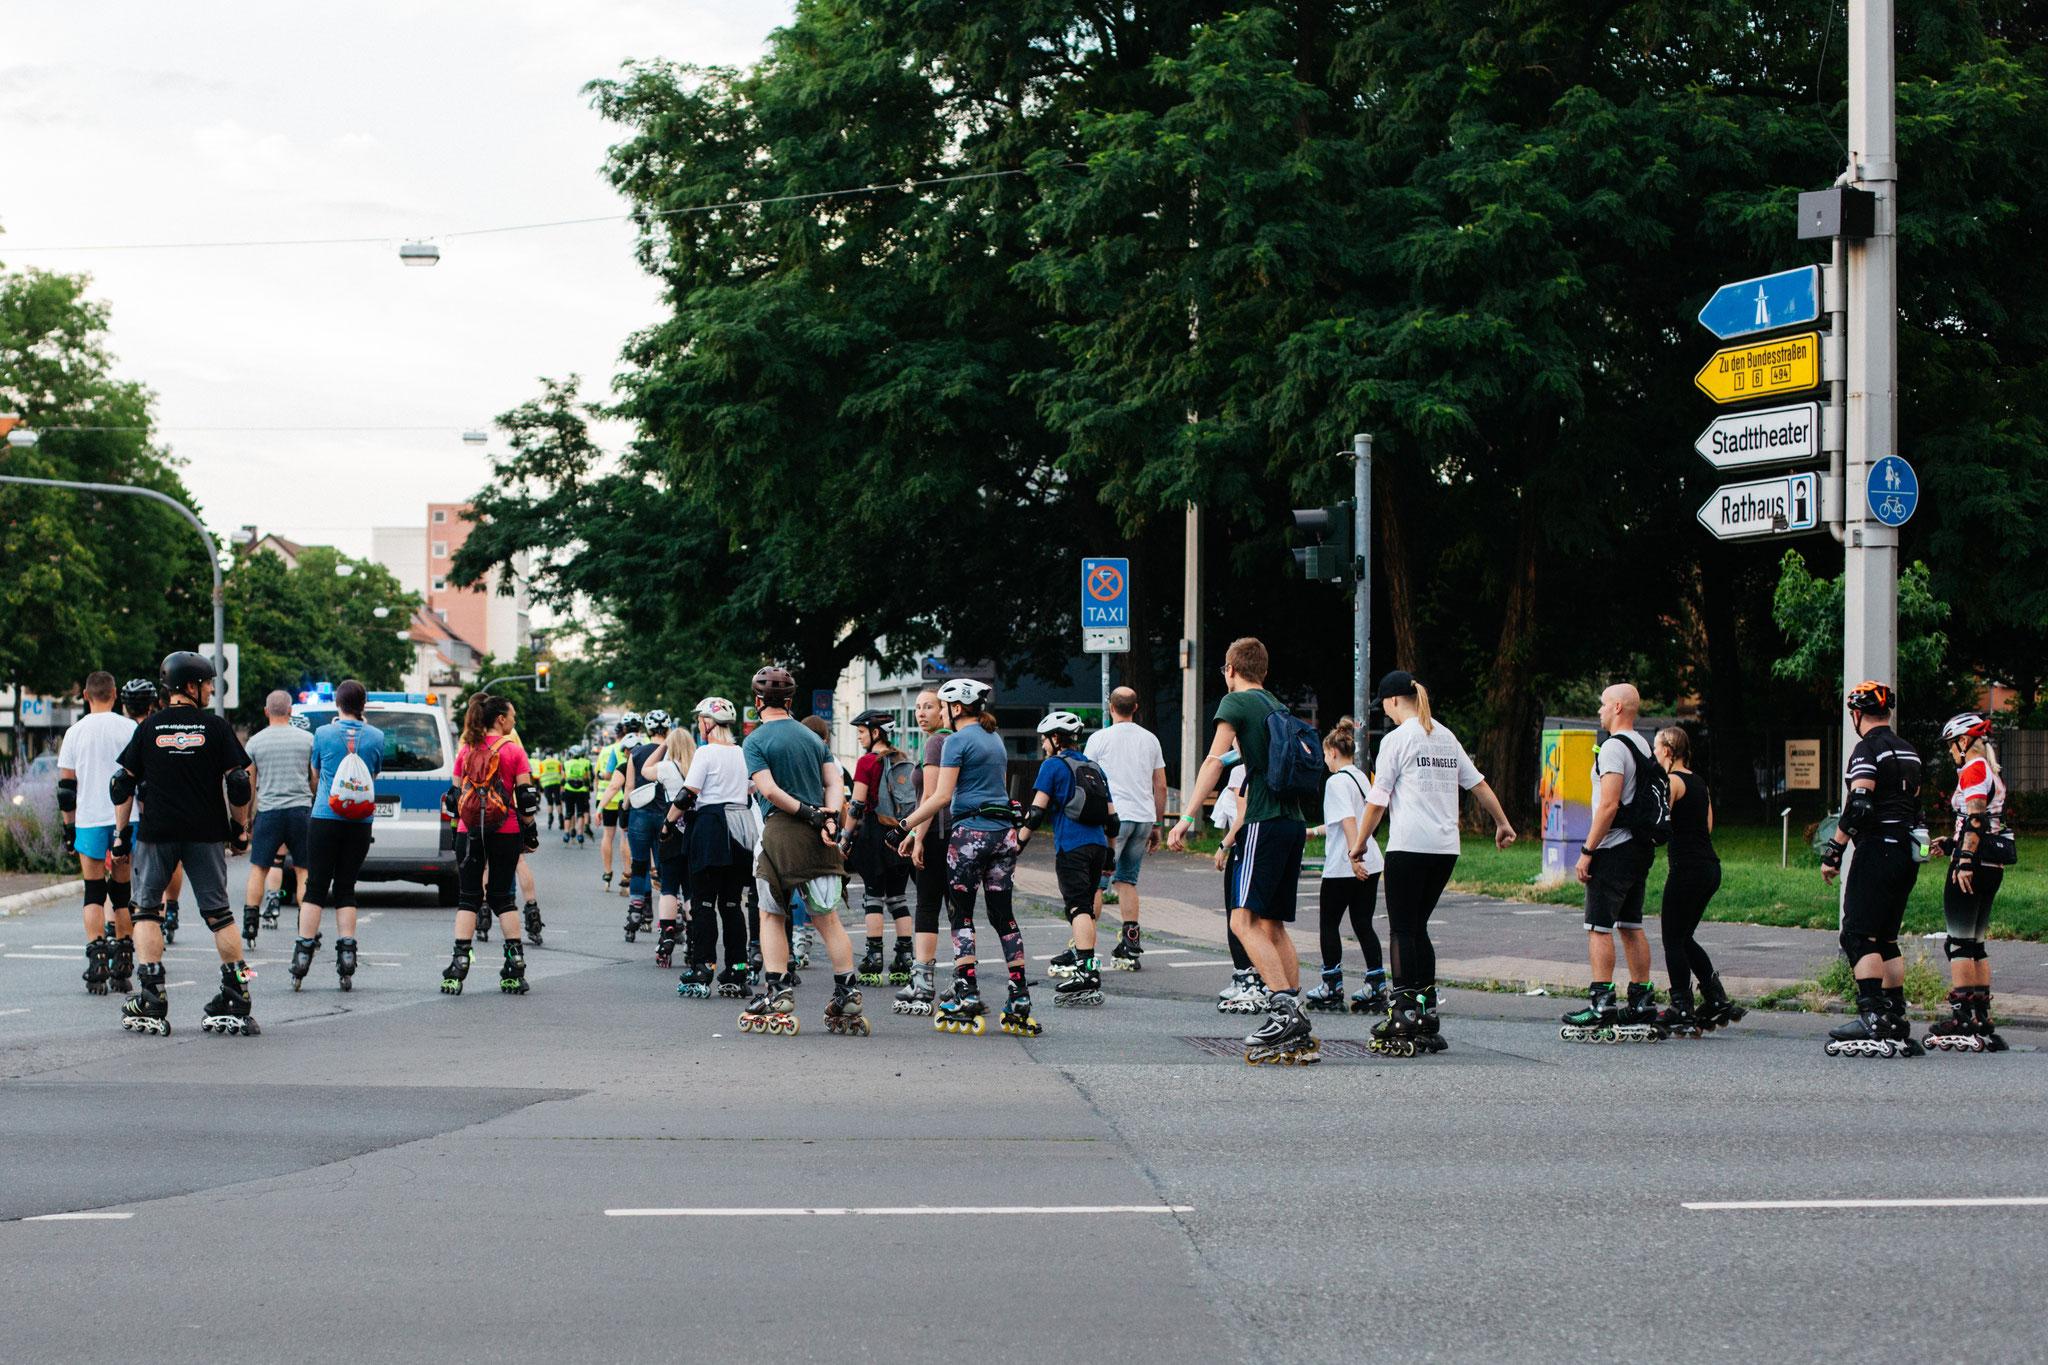 15.7.21, Skate by Night, Hildesheim. Foto Larissa Alija